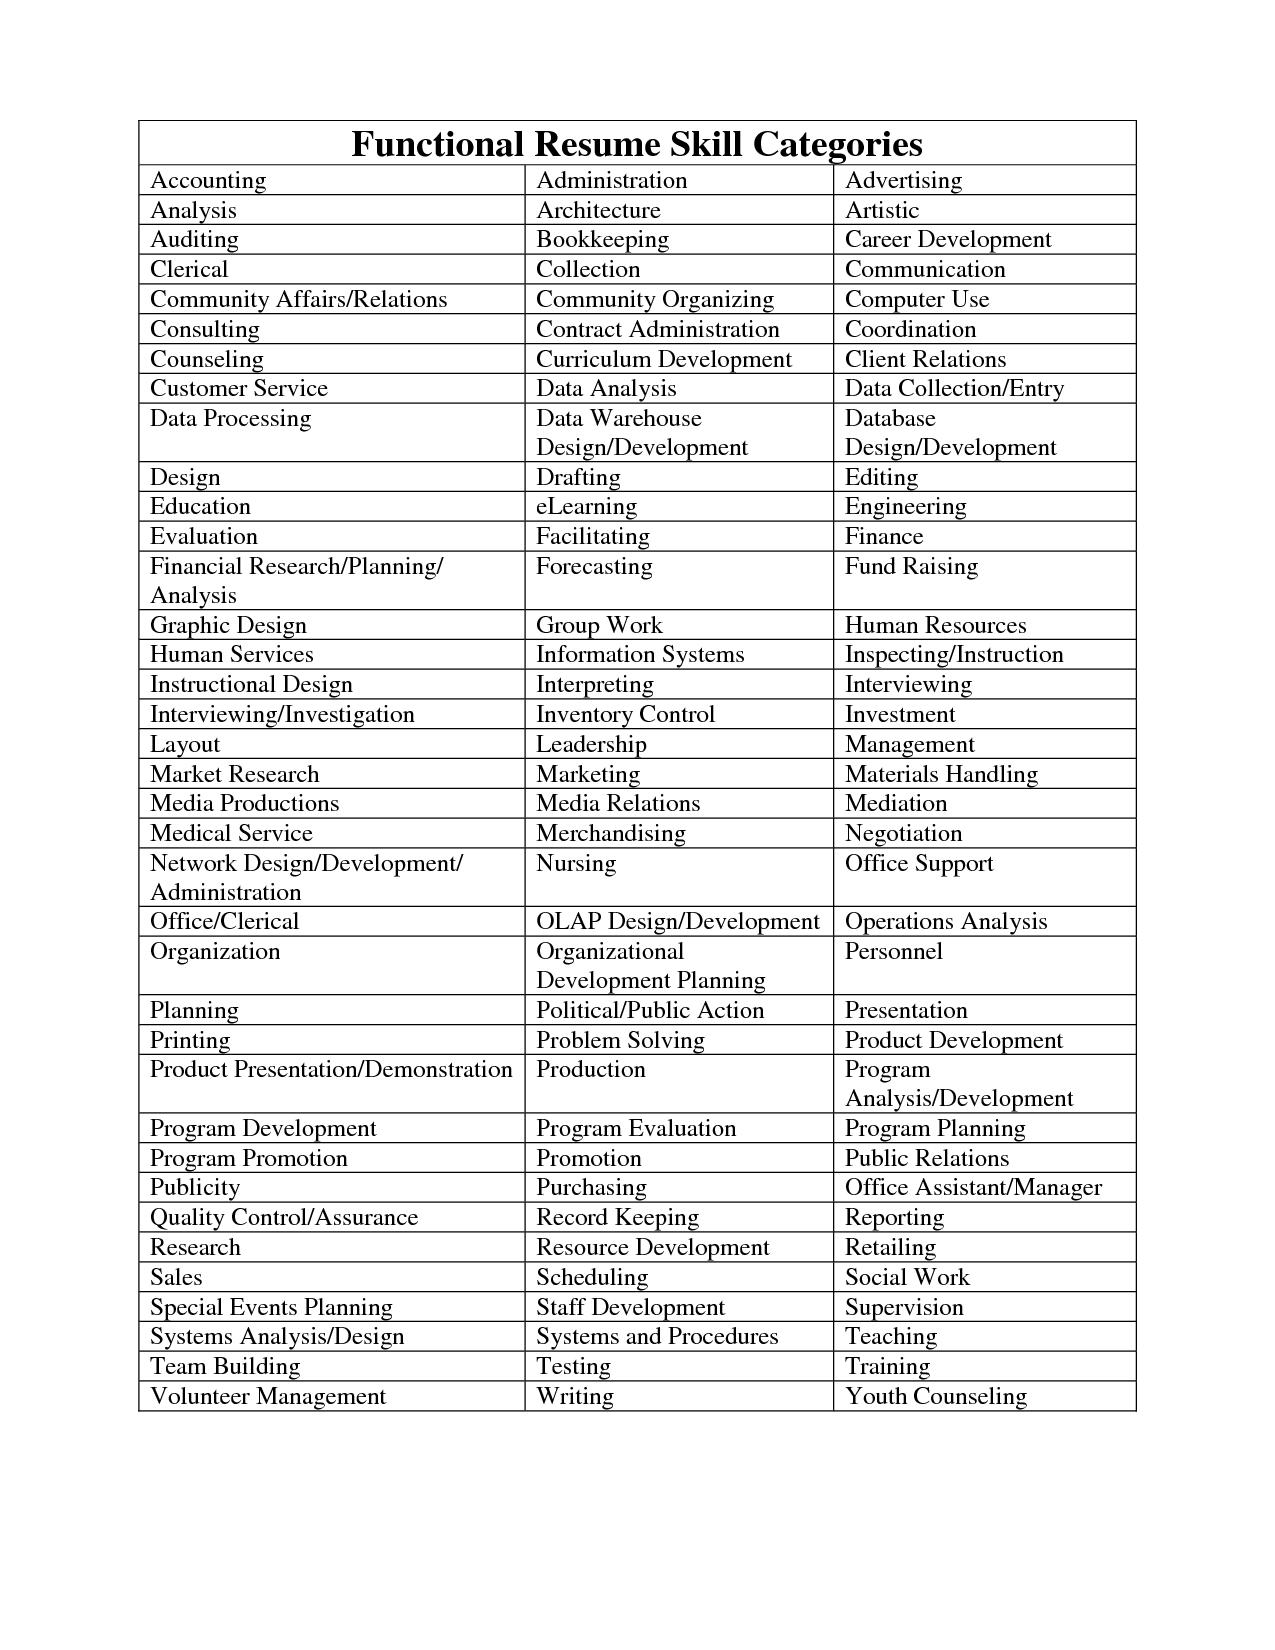 resume categories skills